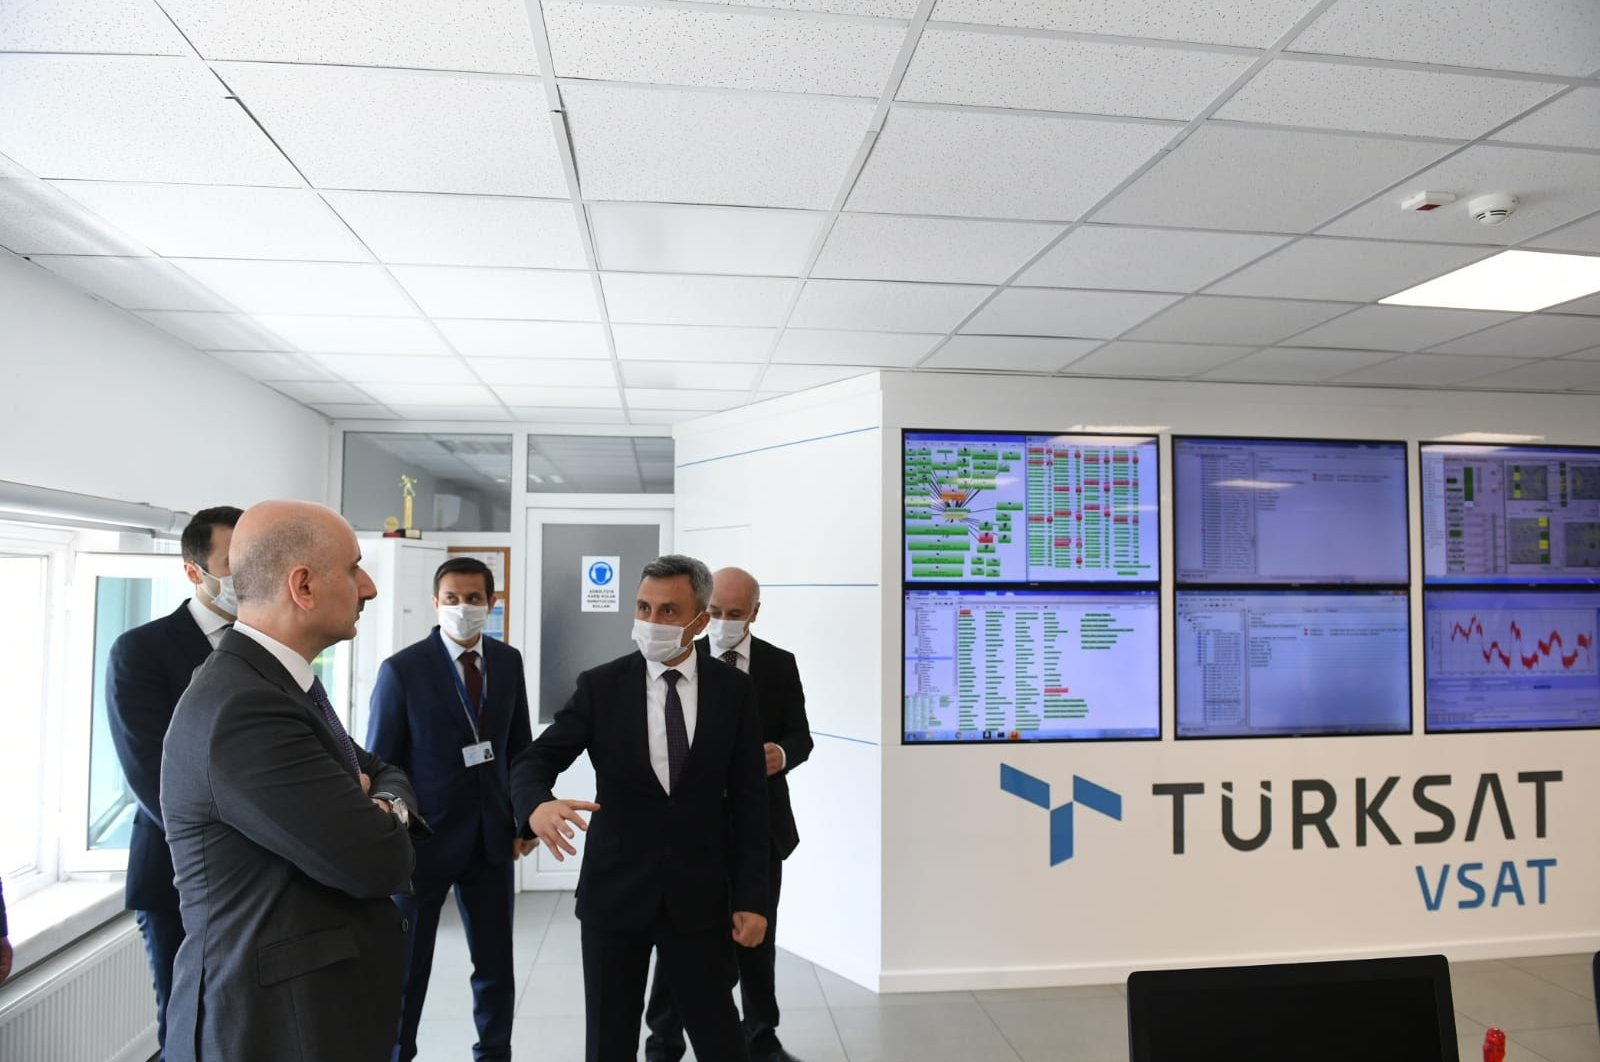 Transportaion and Infrastructure Minister Adil Karaismailoğlu during his visit to Türksat compound in Gölbaşı, Ankara, June 3, 2020. (IHA Photo)